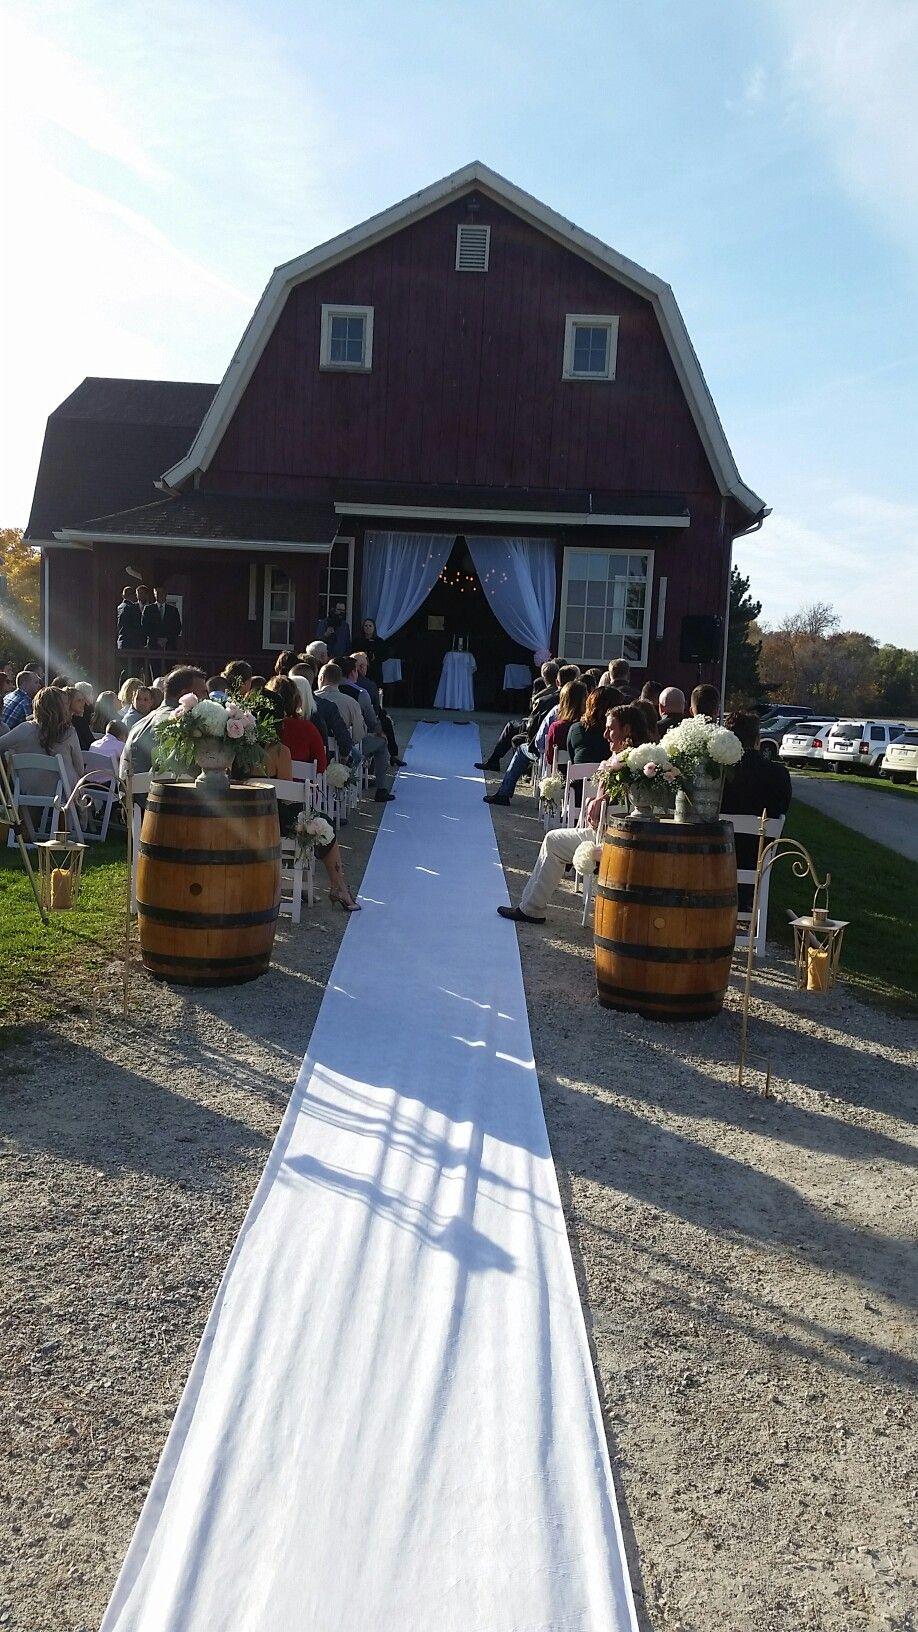 Phillips Barn In Oregon Ohio For Ceremonies And Receptions Indoor Ceremony Wedding Ceremony Location Wedding Ceremony Pictures